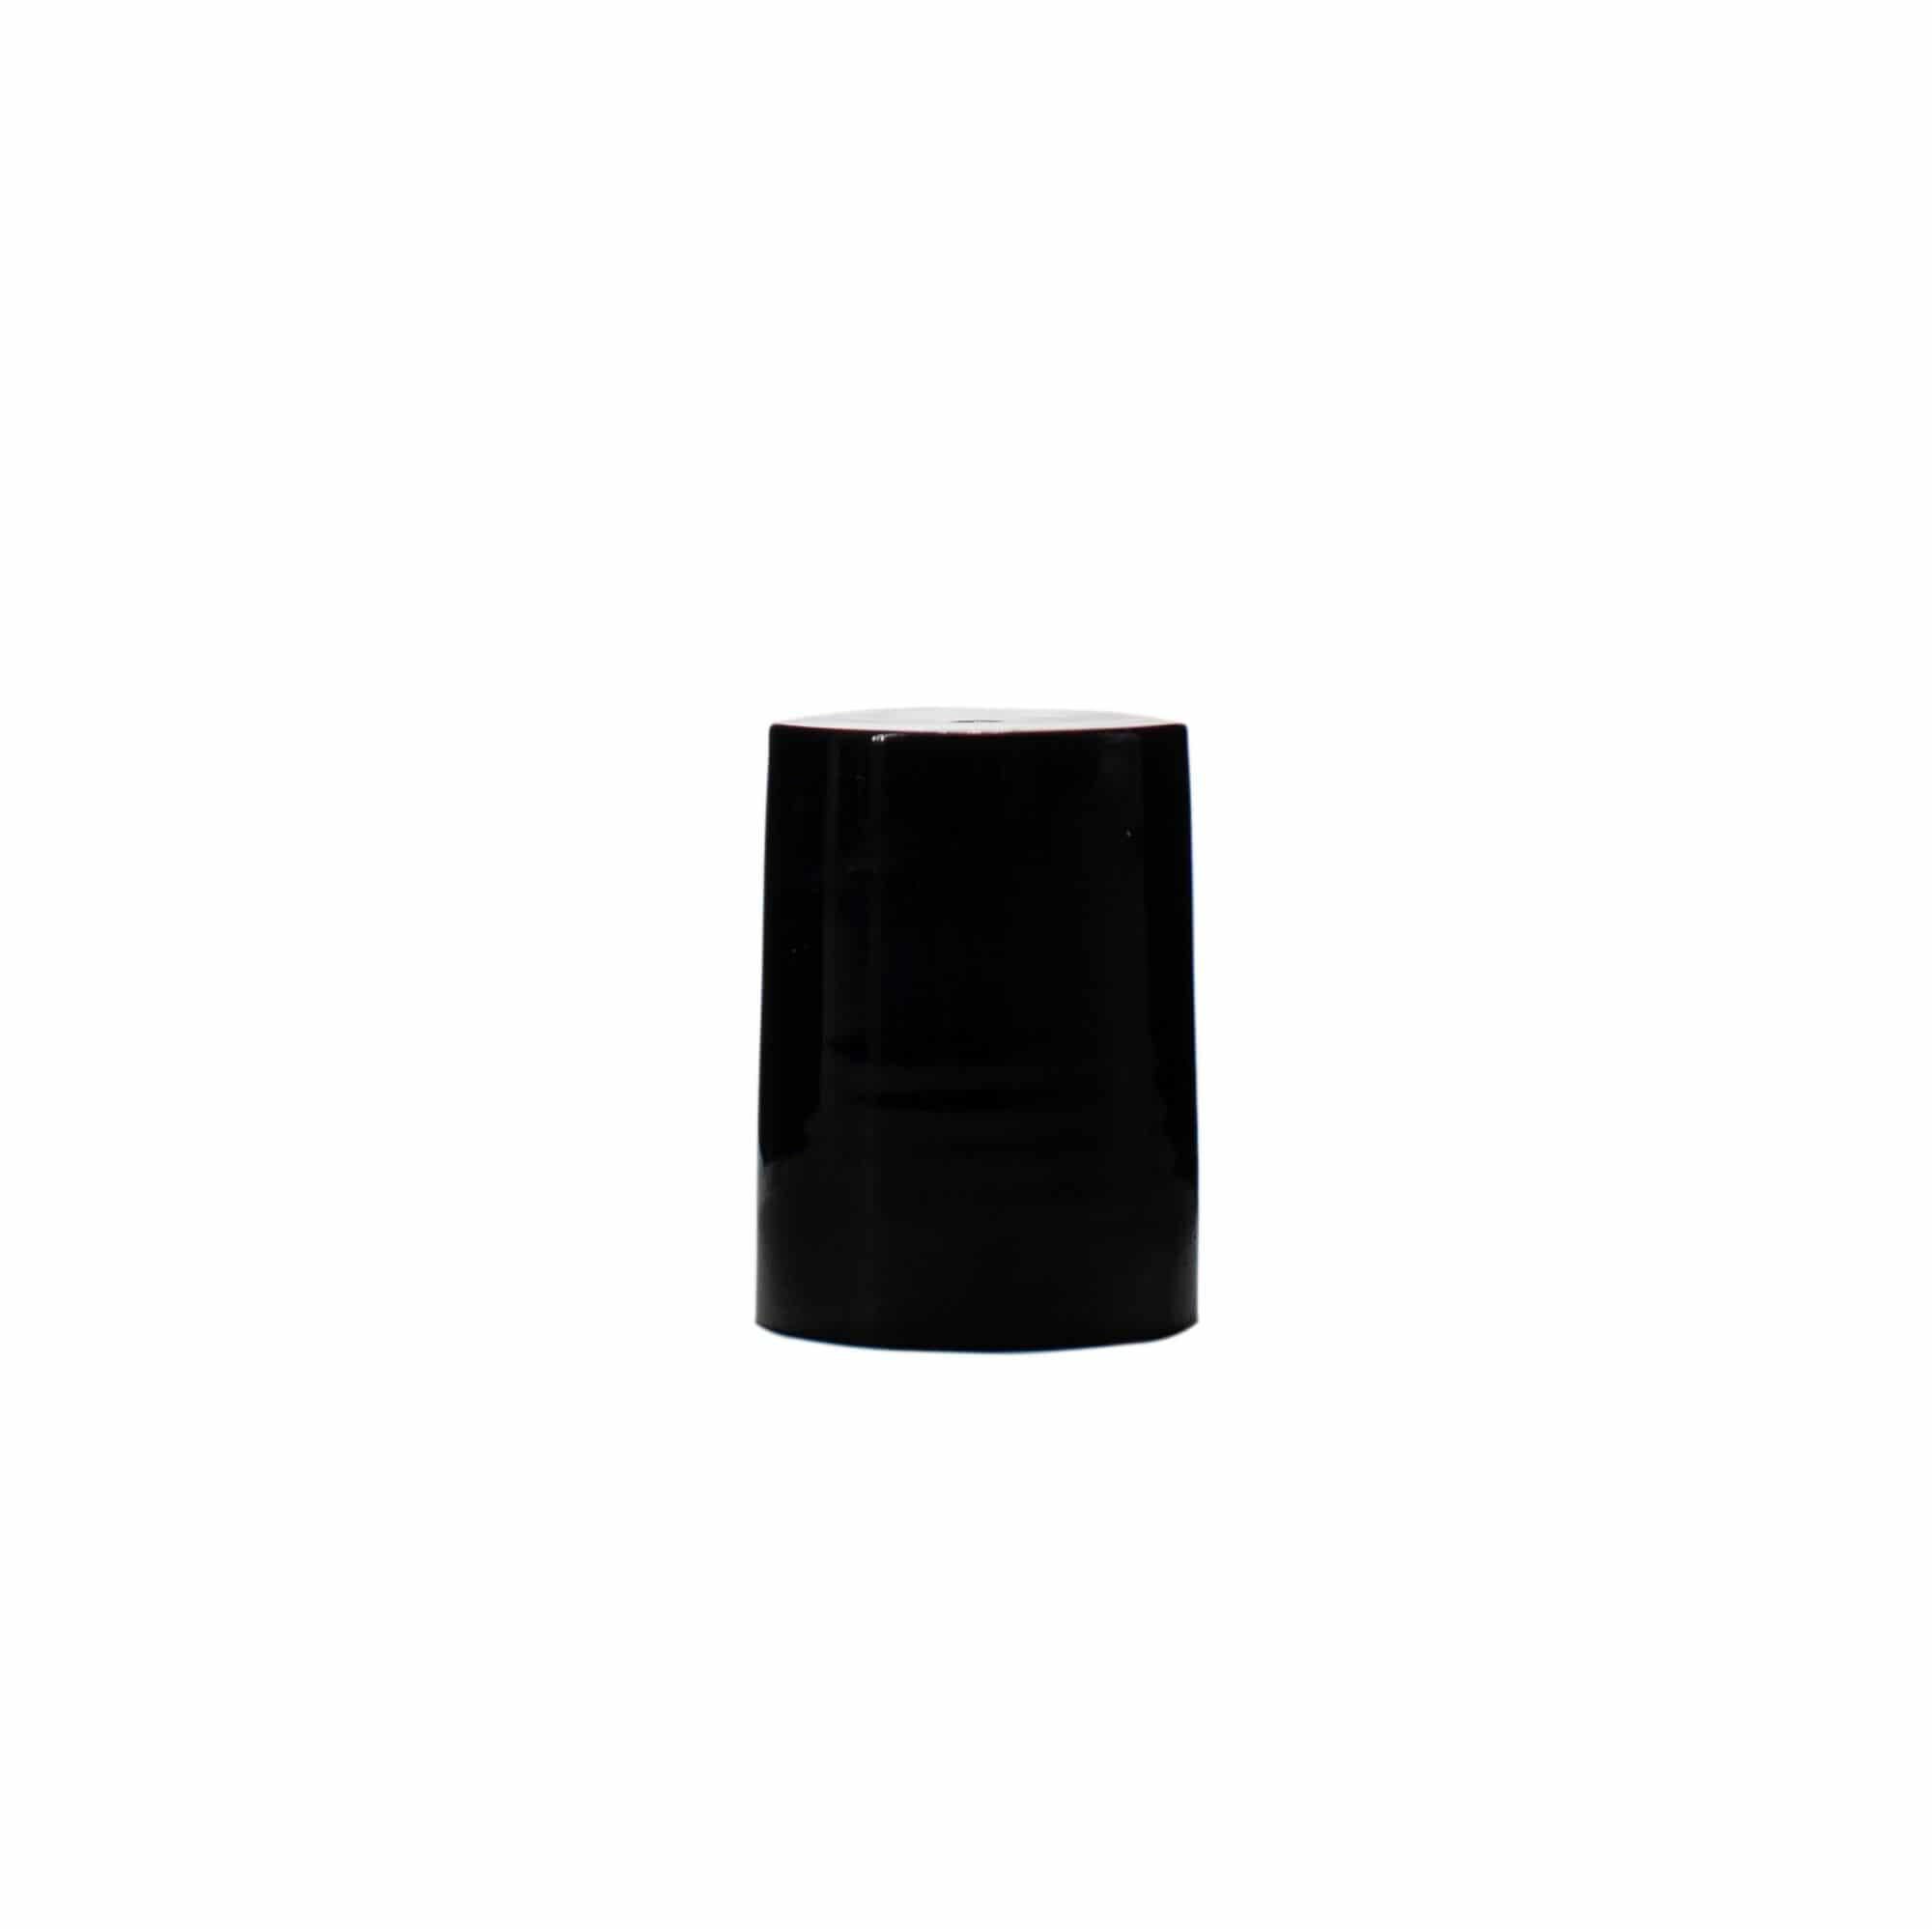 Black 16-415 PP Smooth Skirt Screw Cap